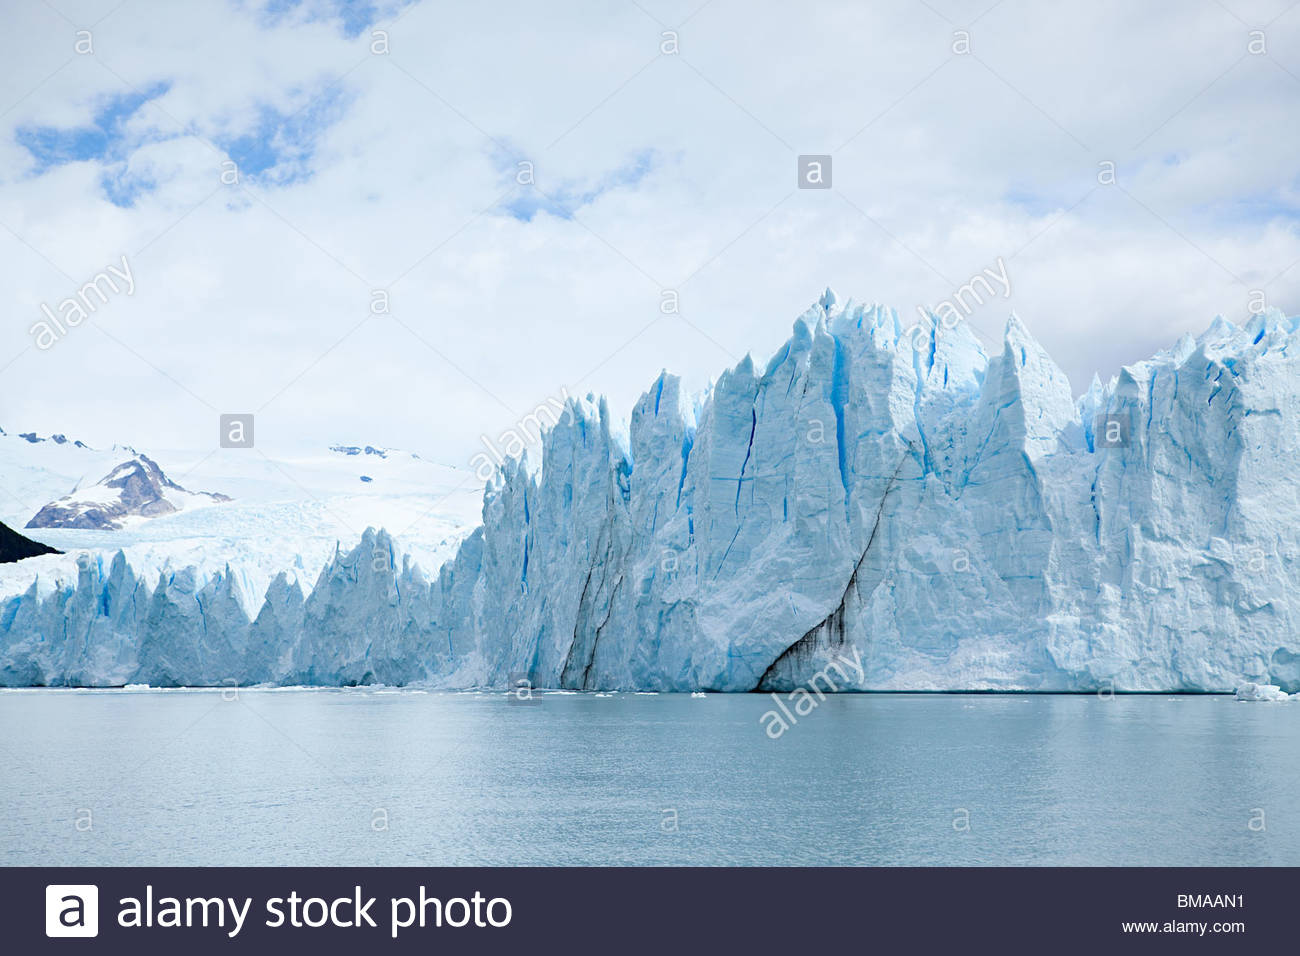 Upsala glacier at el calafate in southern argentina - Stock Image